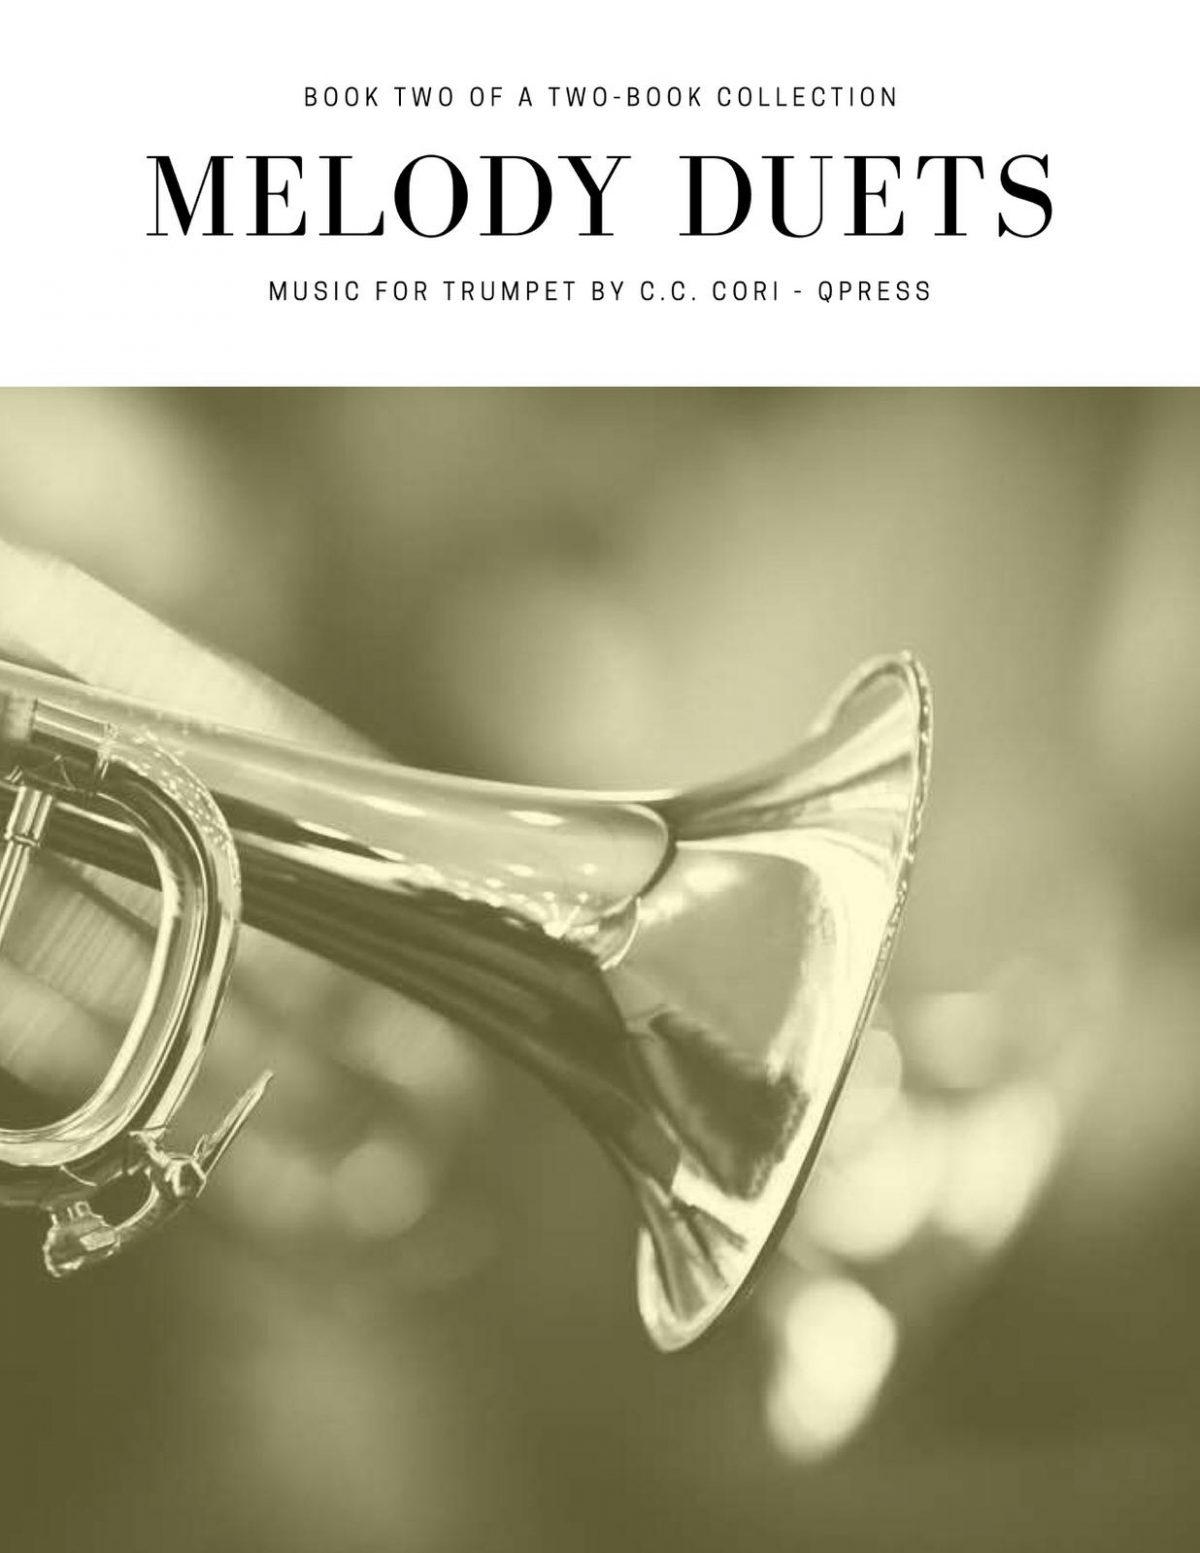 Cori, Melody Duets Book 2-p01